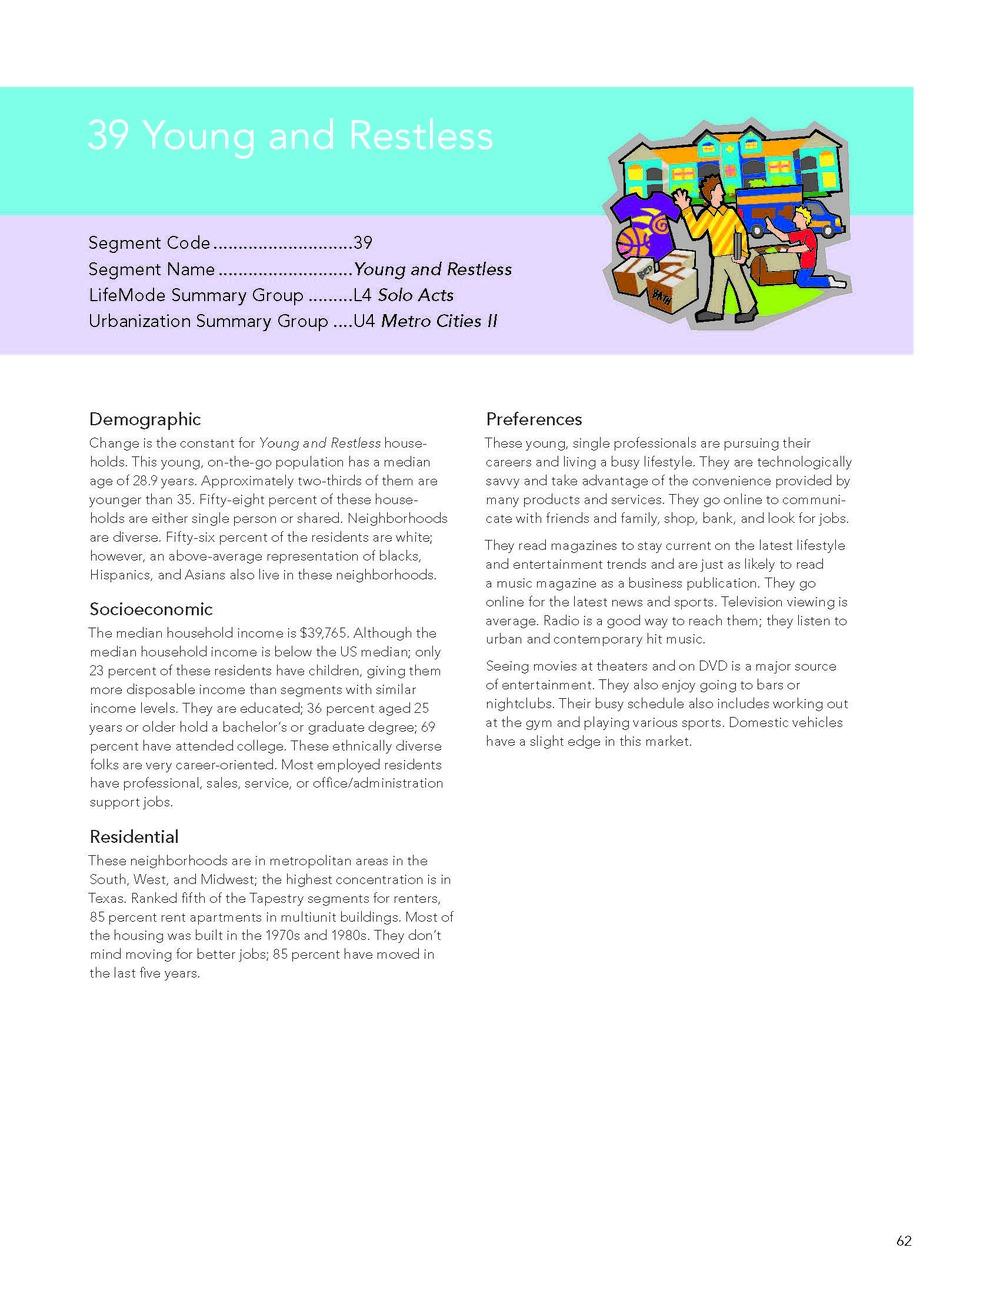 tapestry-segmentation_Page_65.jpg